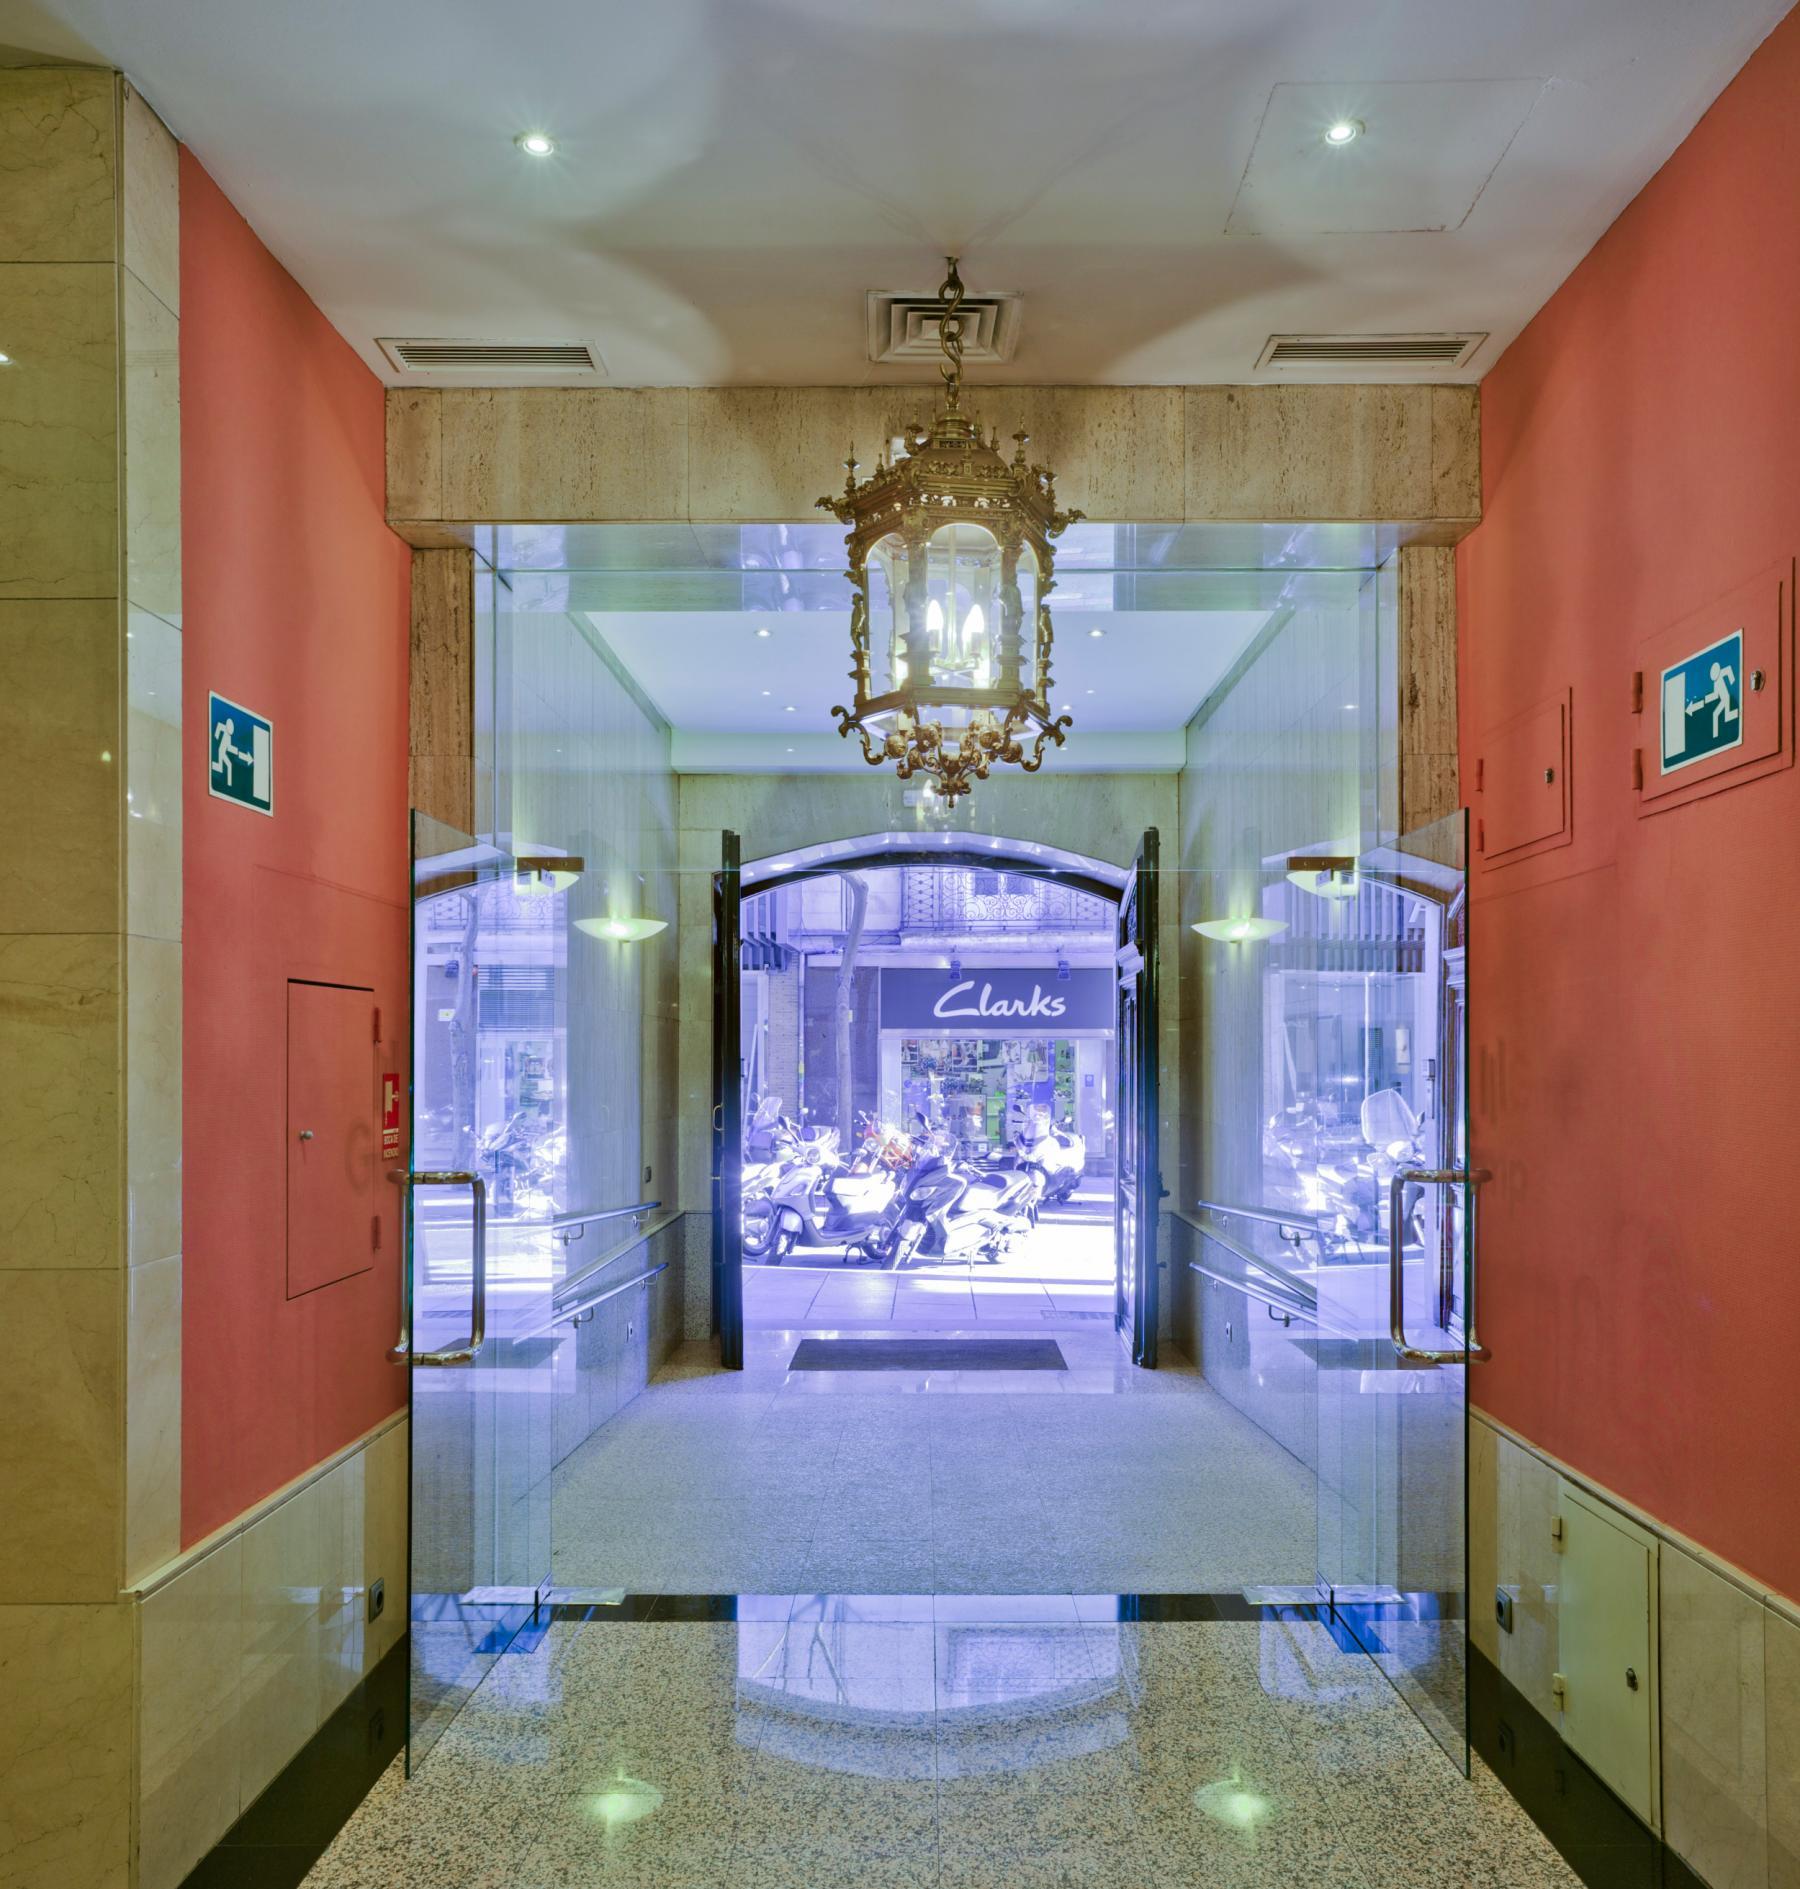 Alquilar oficinas Calle de Hermosilla 11, Madrid (8)